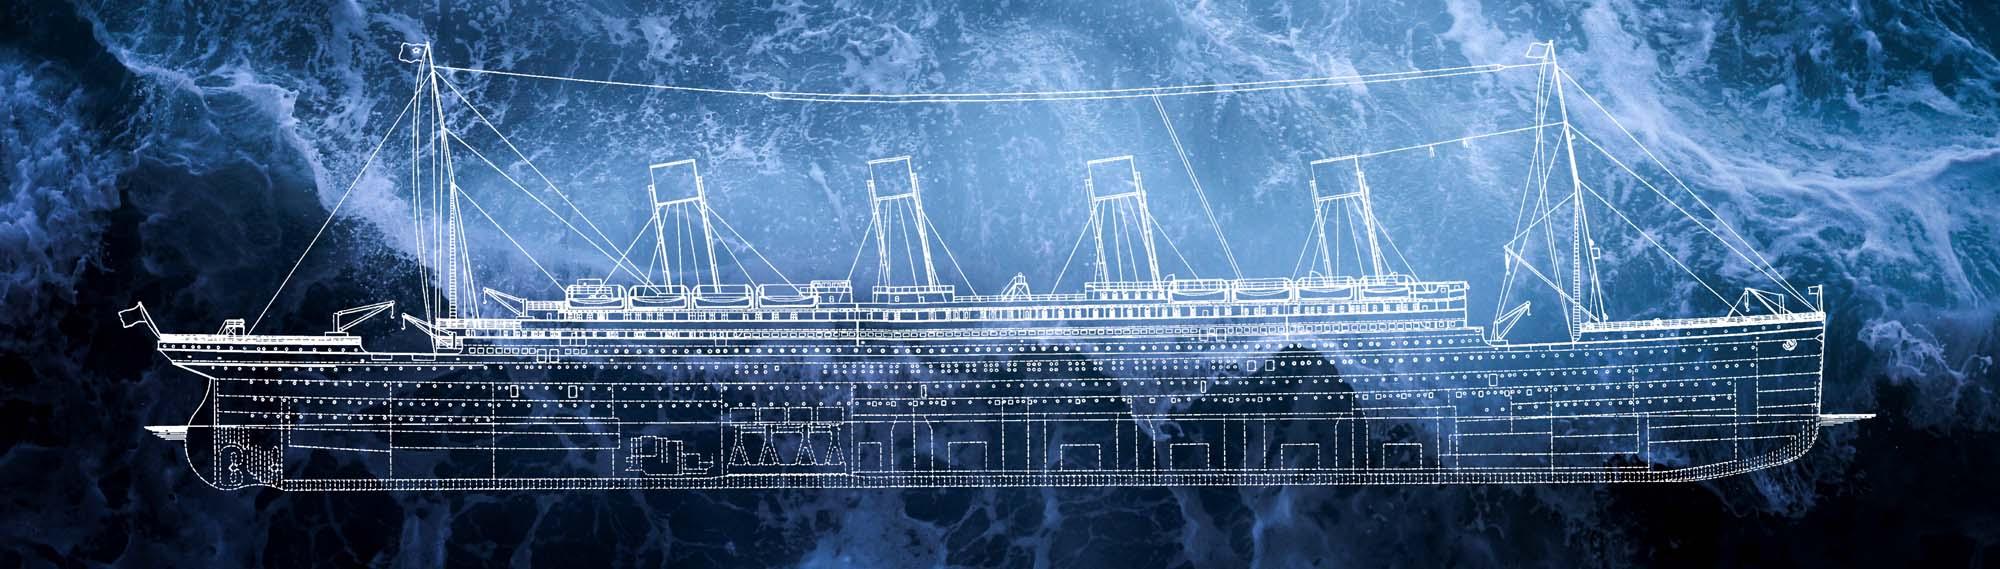 02_BOS_Titanic_ship_HR